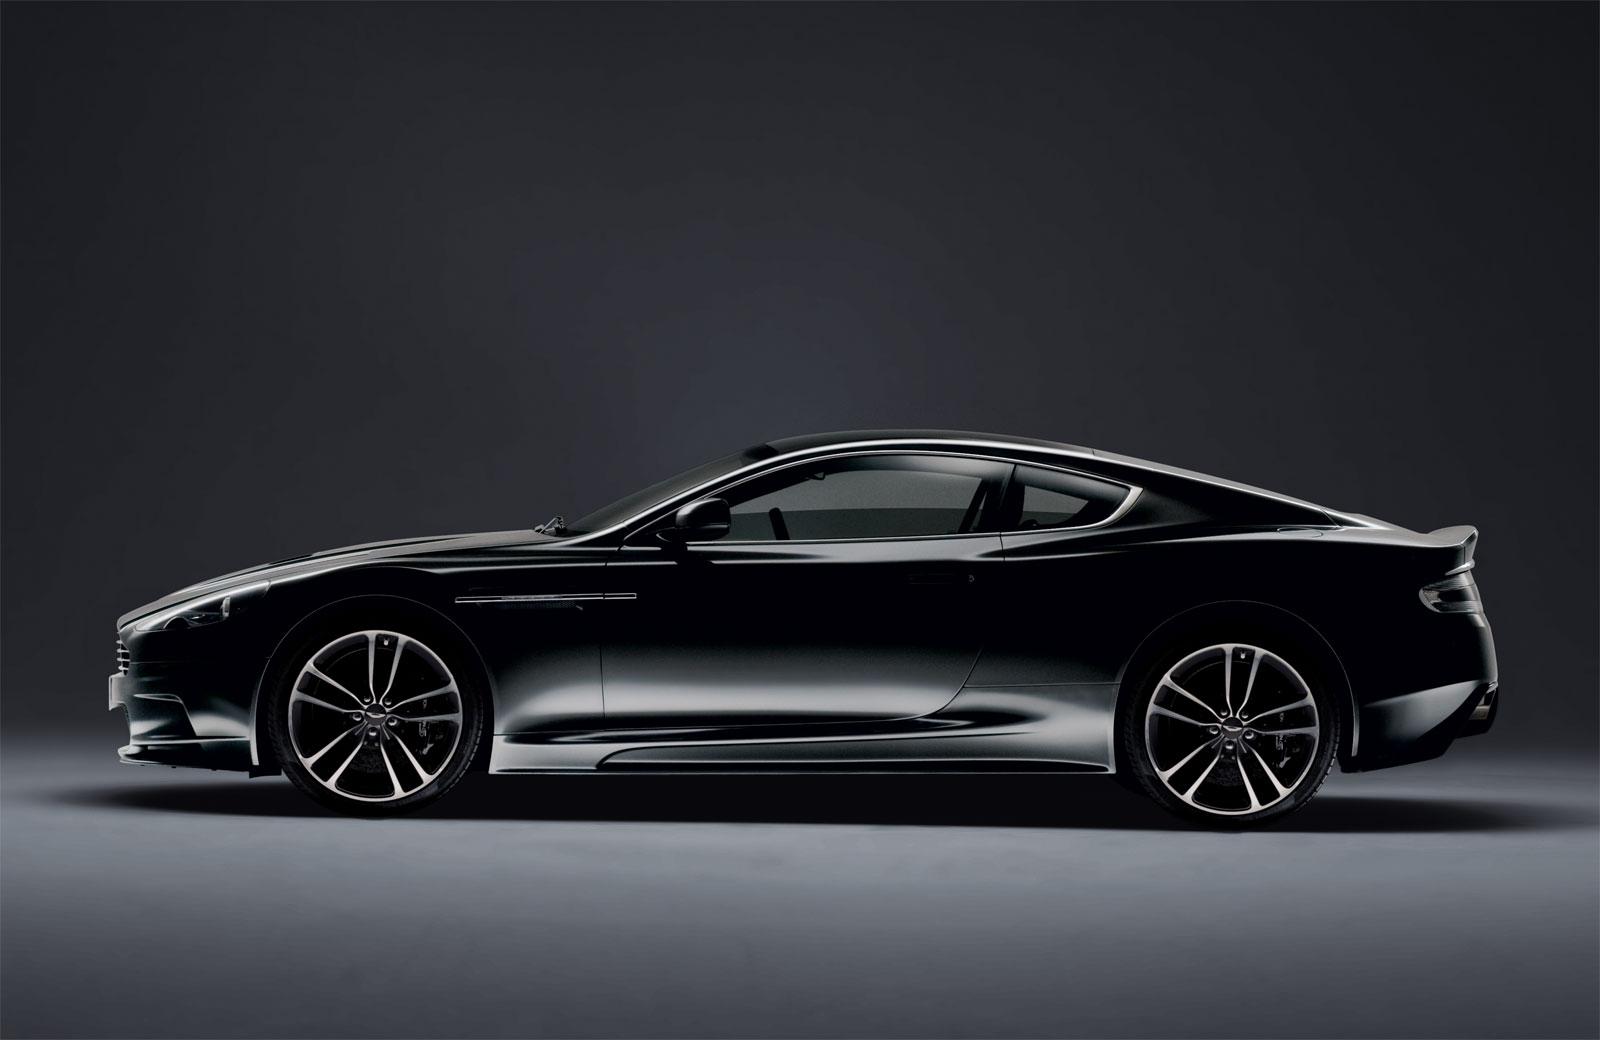 Sport Cars: Aston Martin DBS Hd Wallpapers 2010